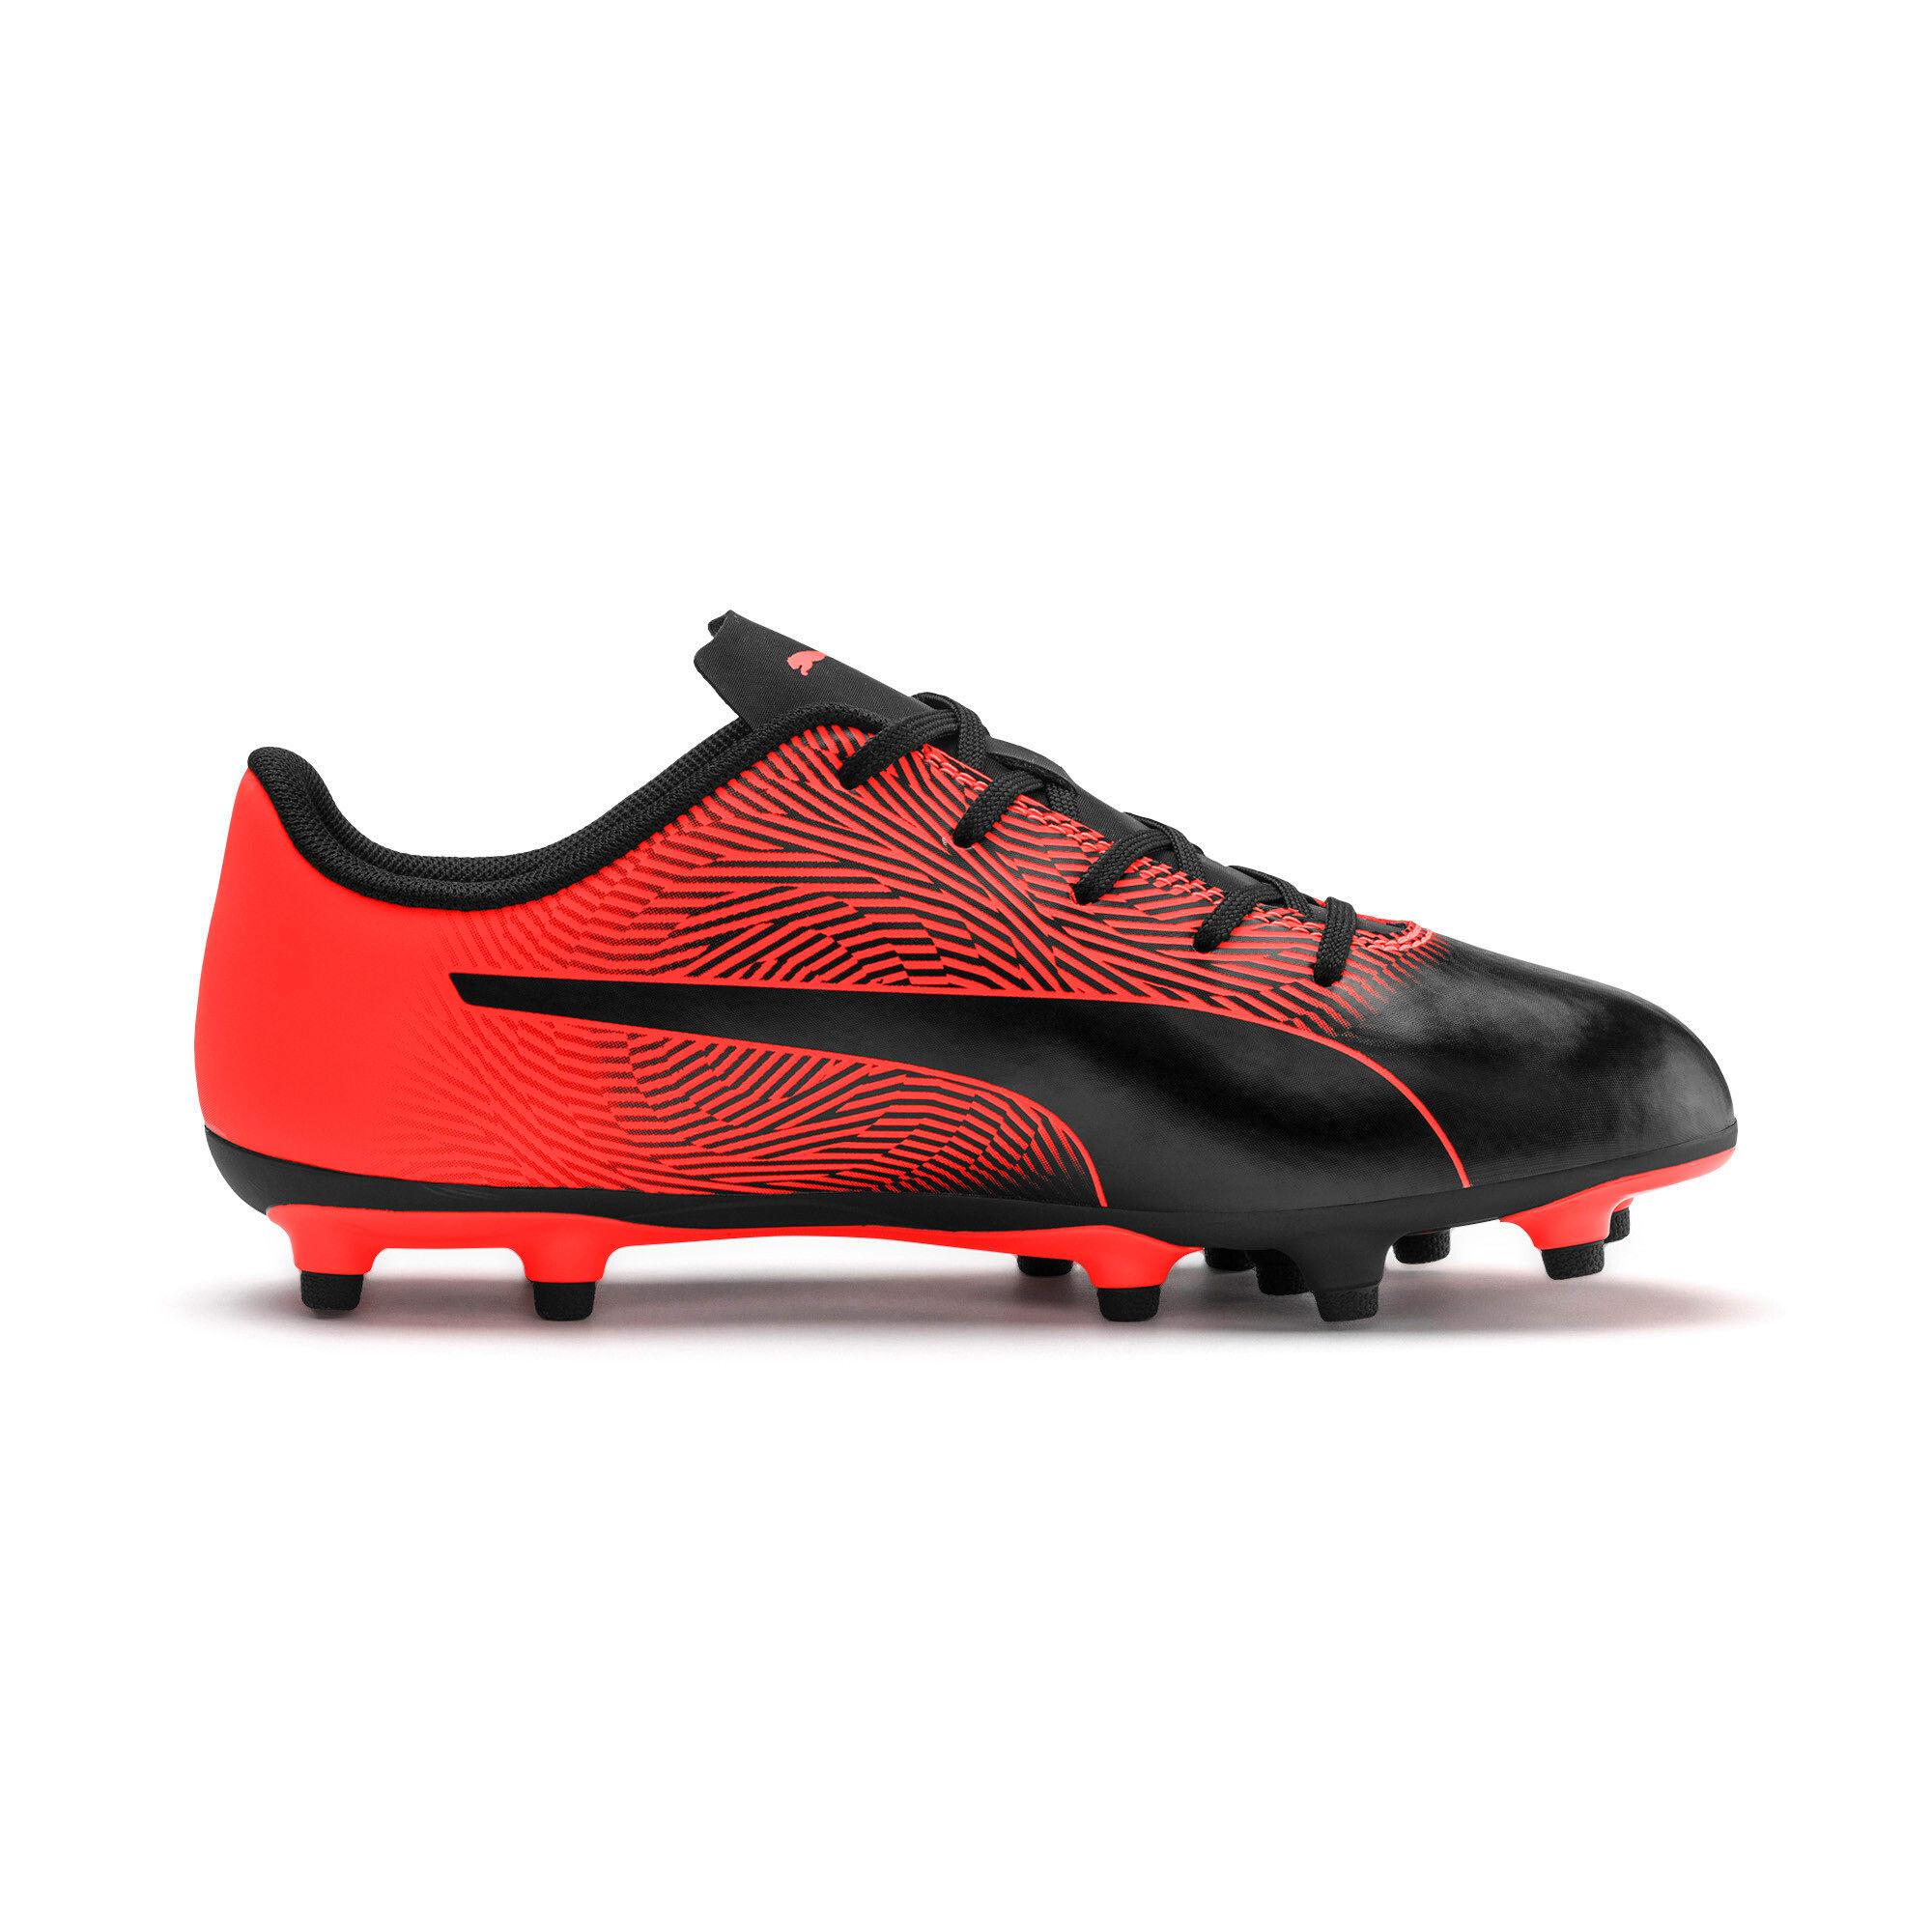 Thumbnail 3 of PUMA Spirit II FG Youth Football Boots, Puma Black-Nrgy Red, medium-IND